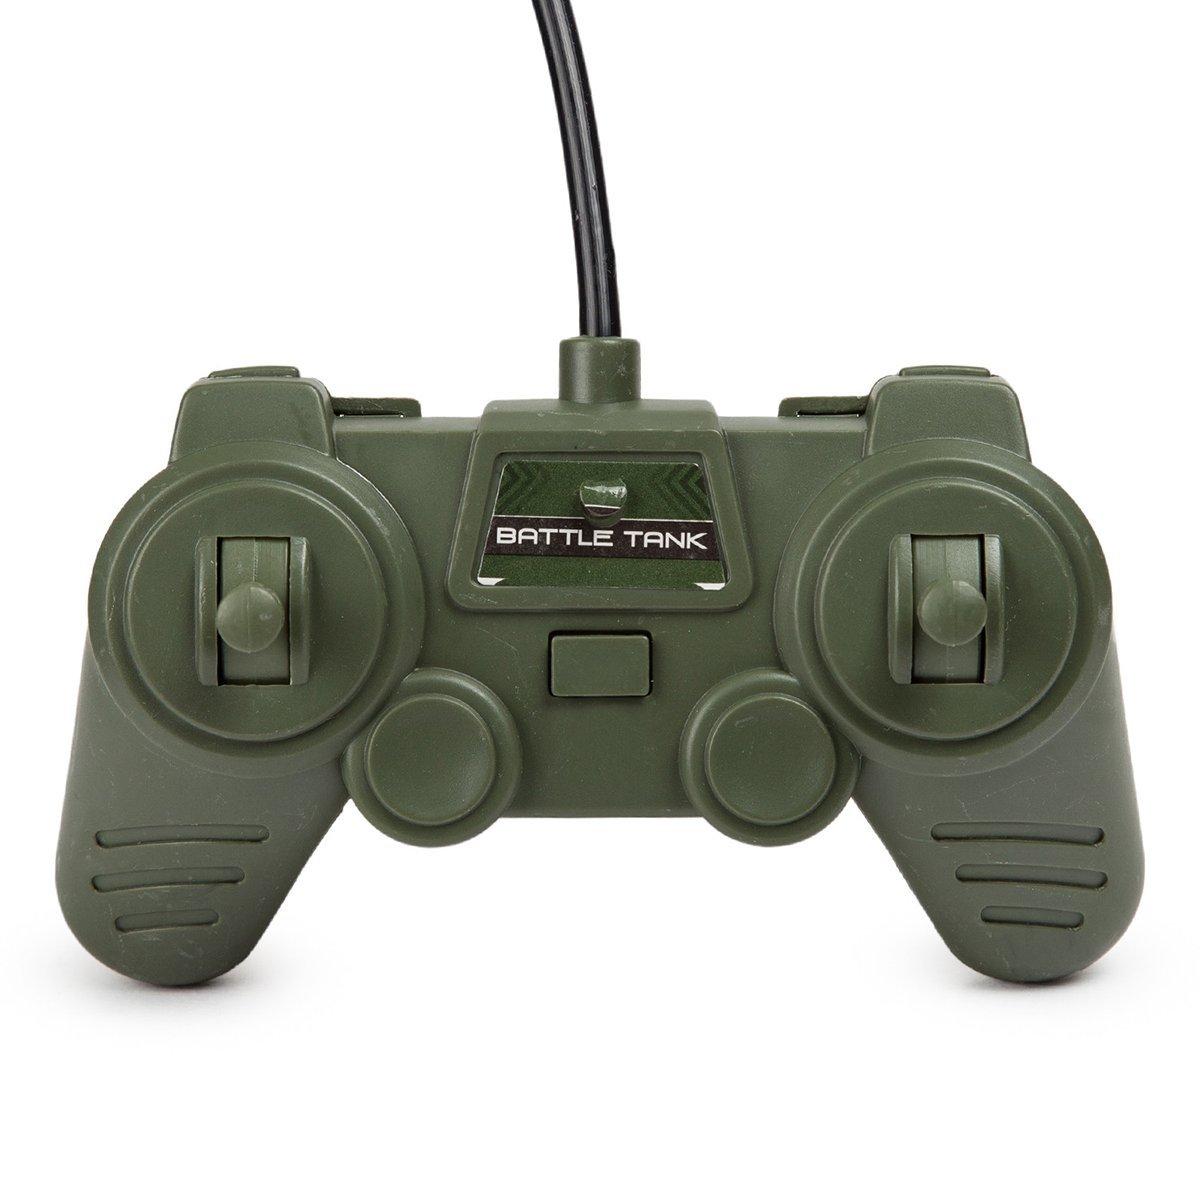 Игровой набор Qunxing Toys Танки 333-TK11A 333-TK11A ТМ: Qunxing Toys